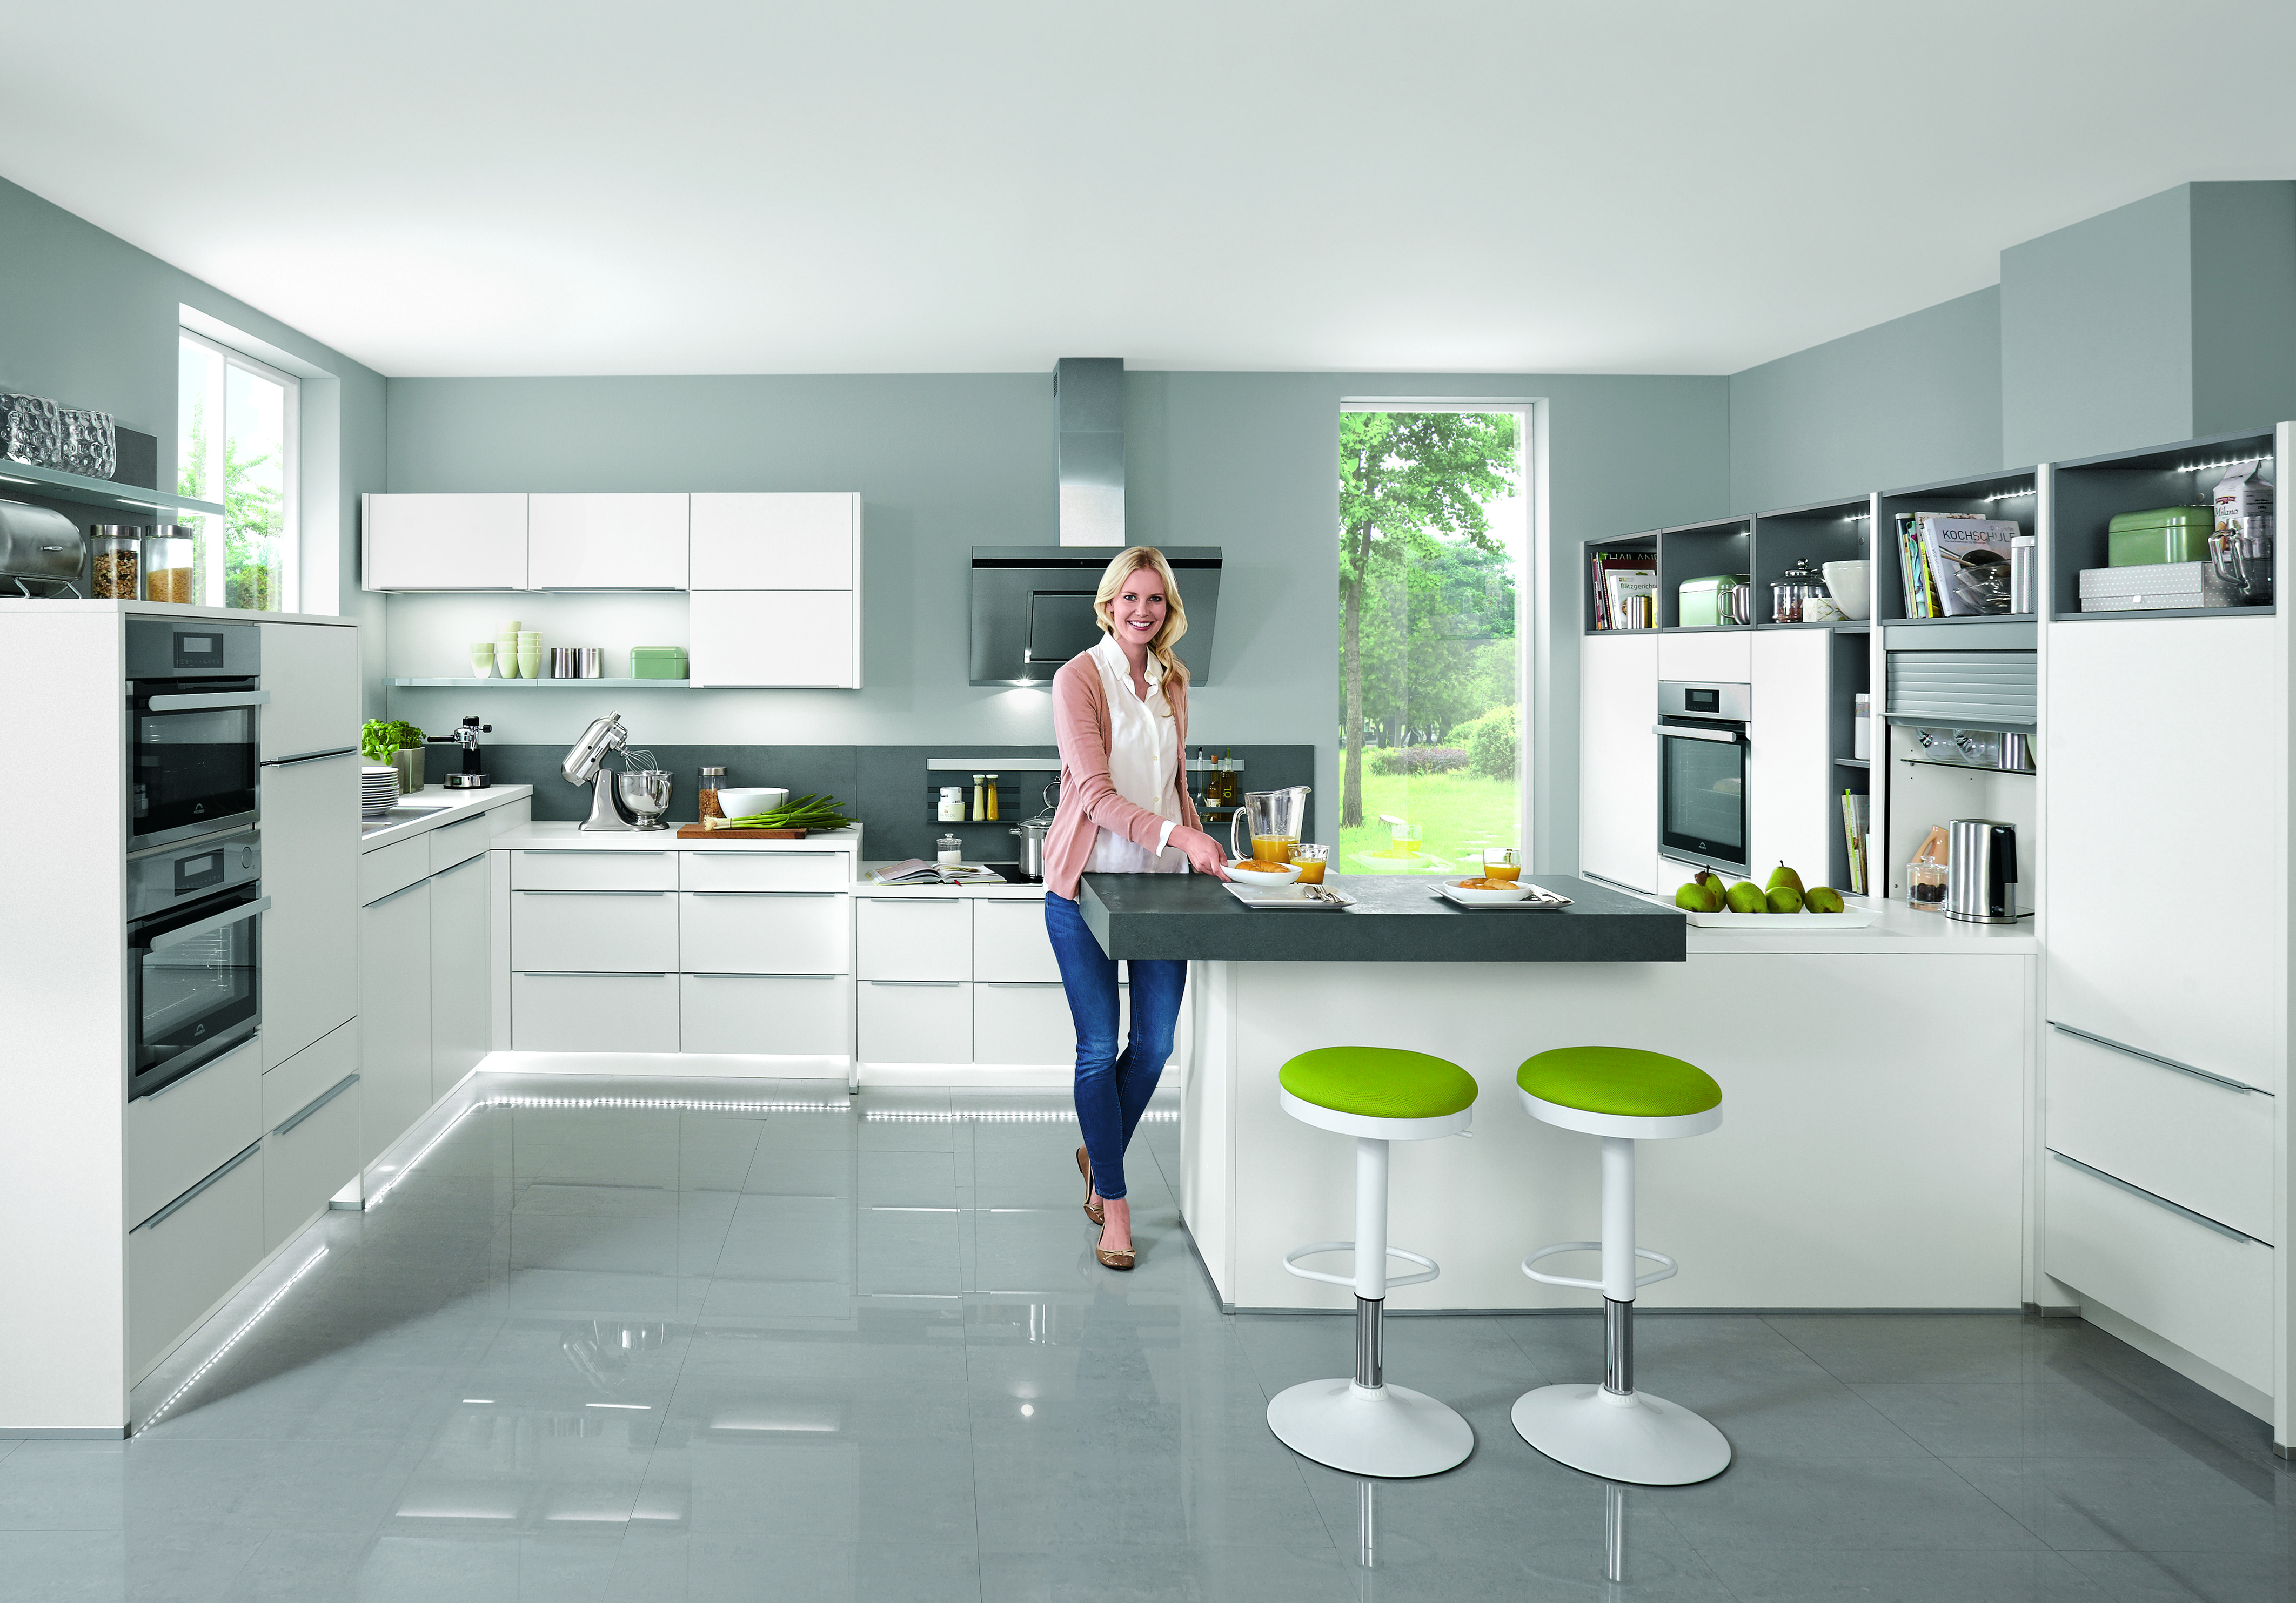 Erfreut Küche Lebensmittel Abstellflächen Fotos - Küchen Design ...